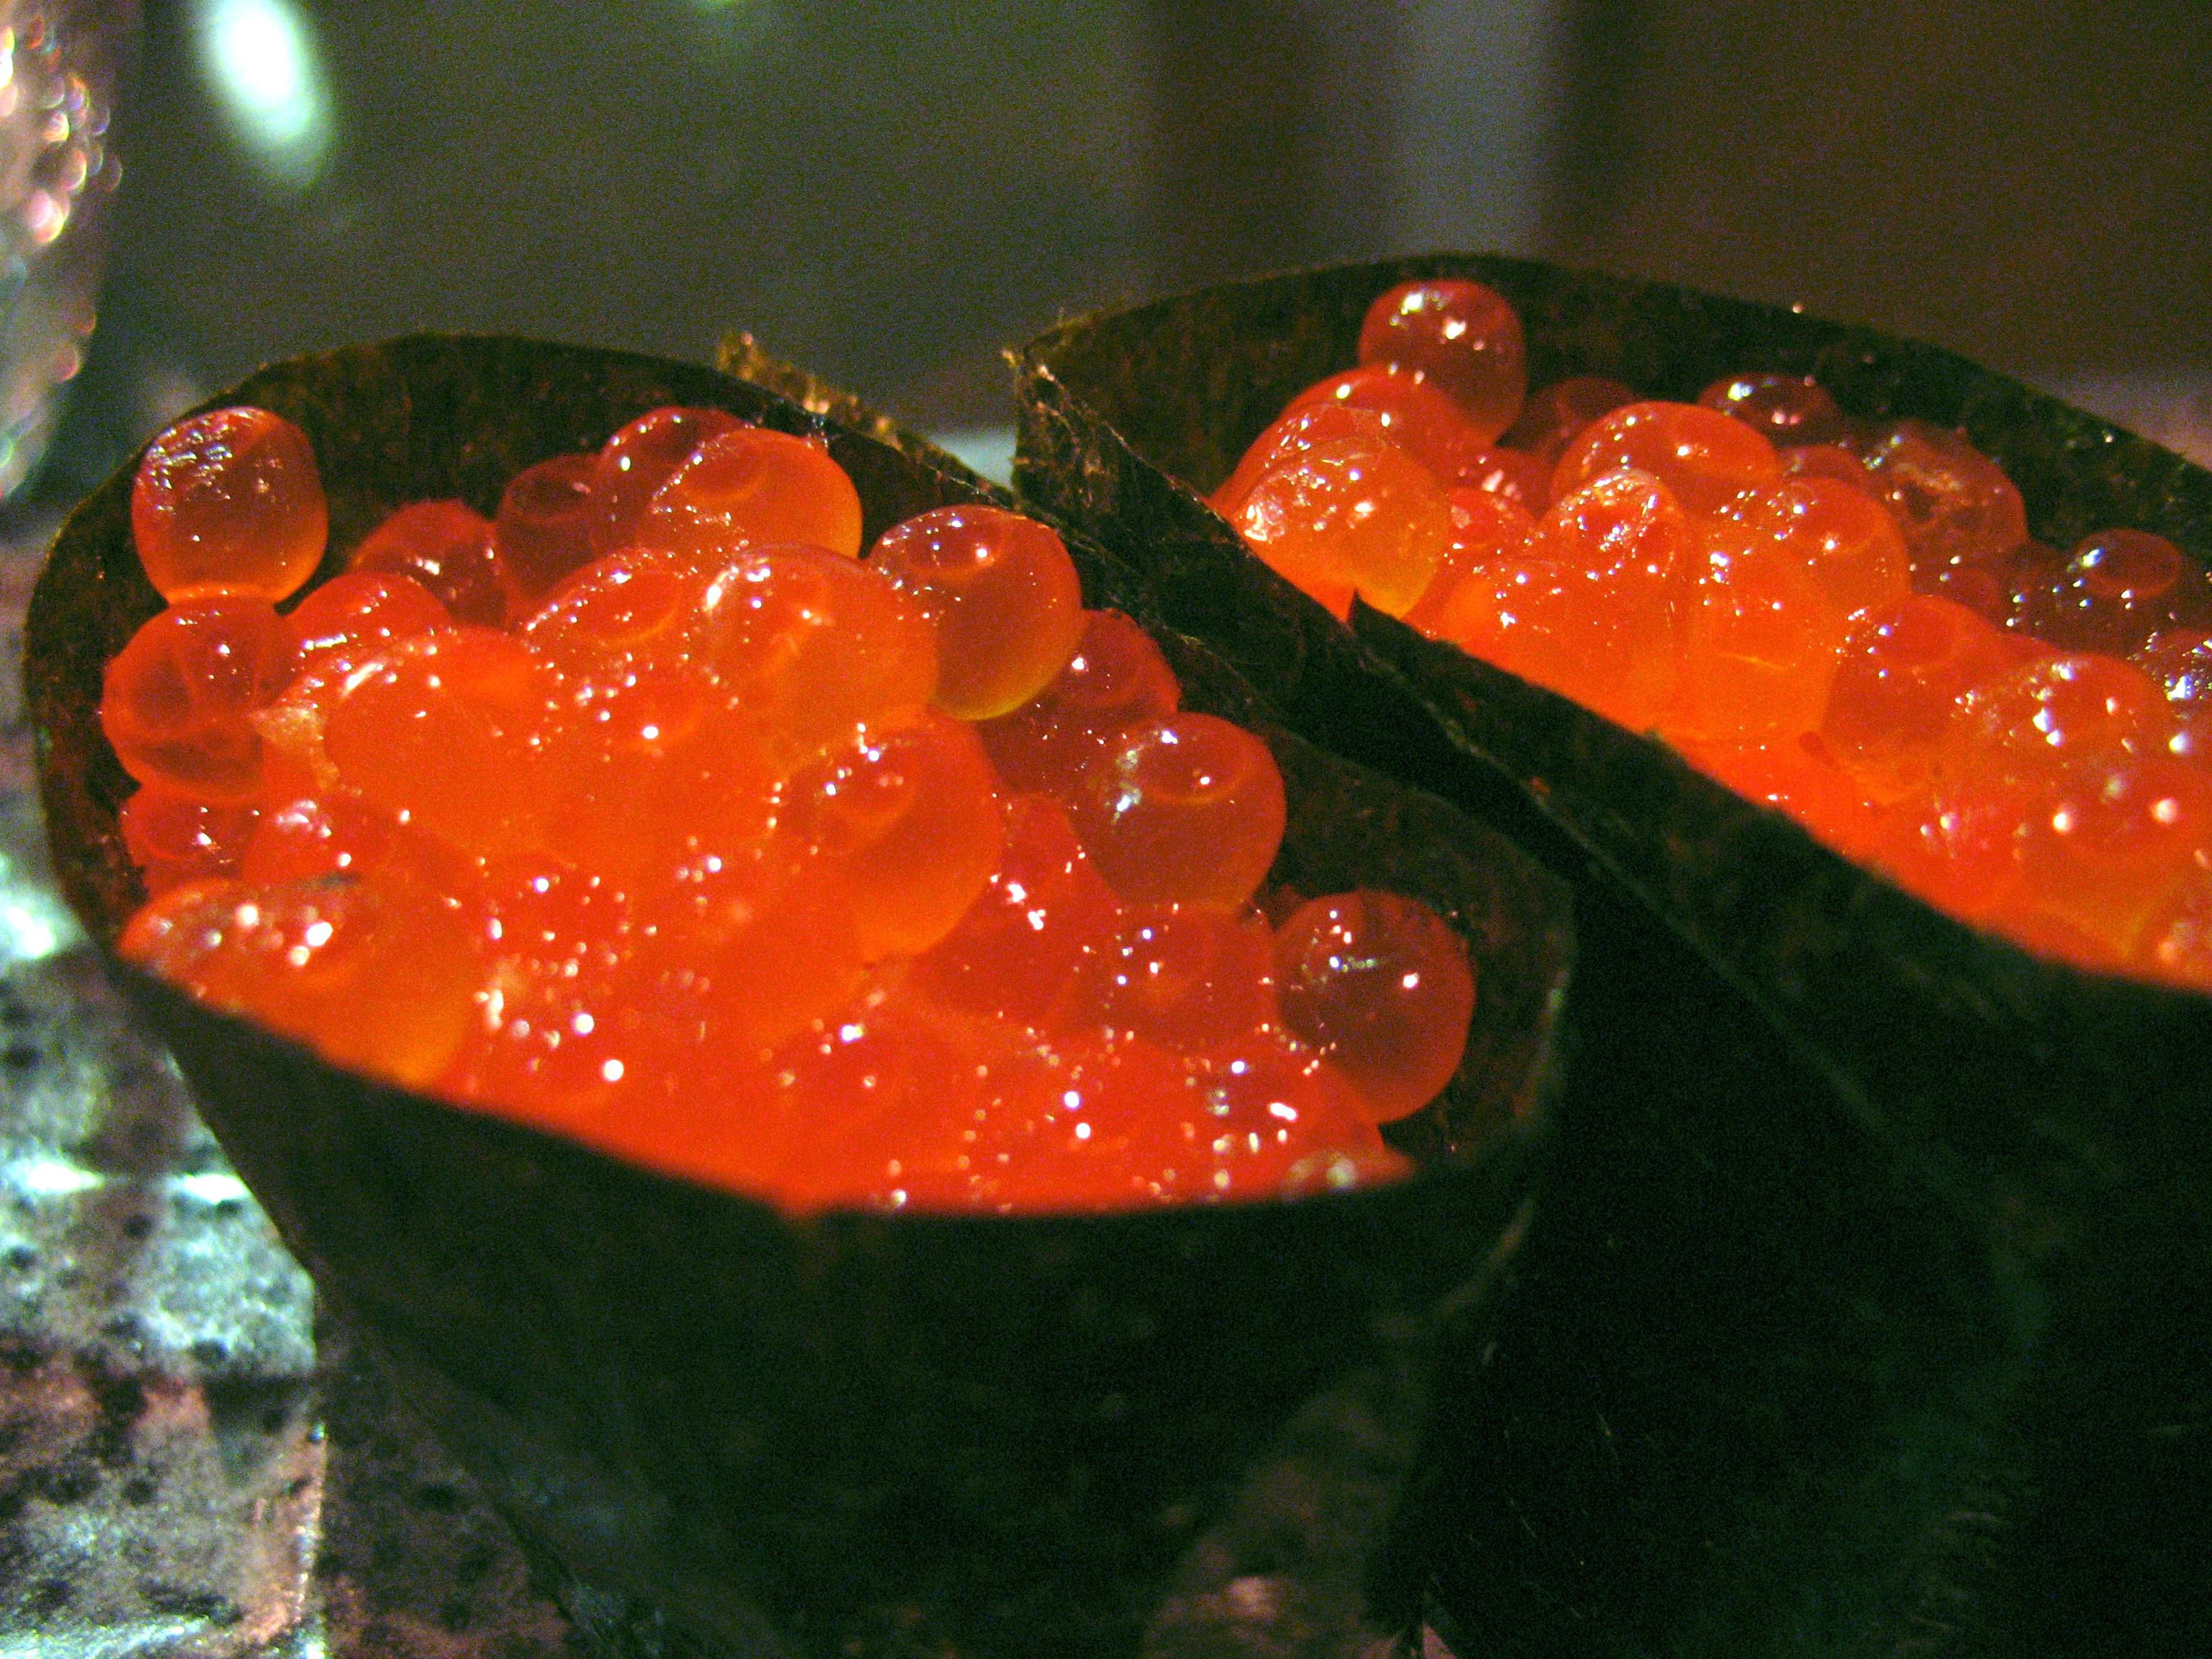 List of sushi and sashimi ingredients - Wikipedia